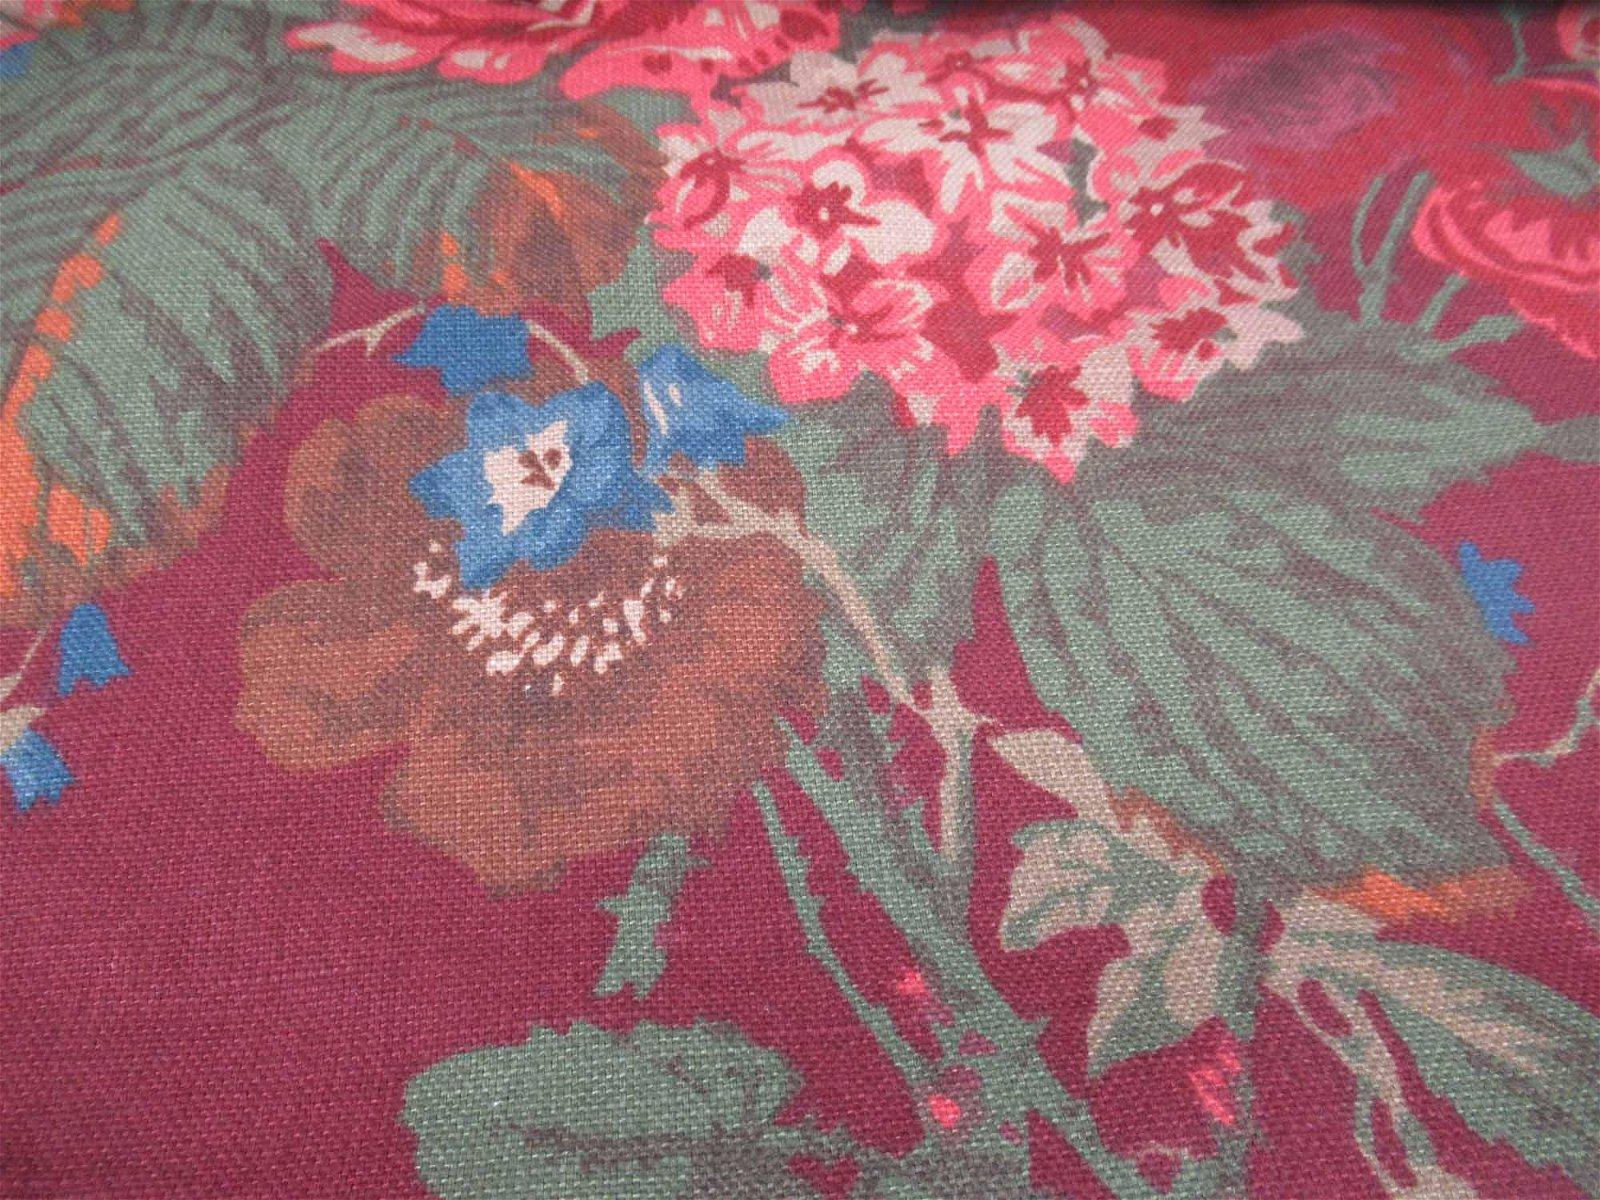 Ralph Lauren Claret Floral Fabric